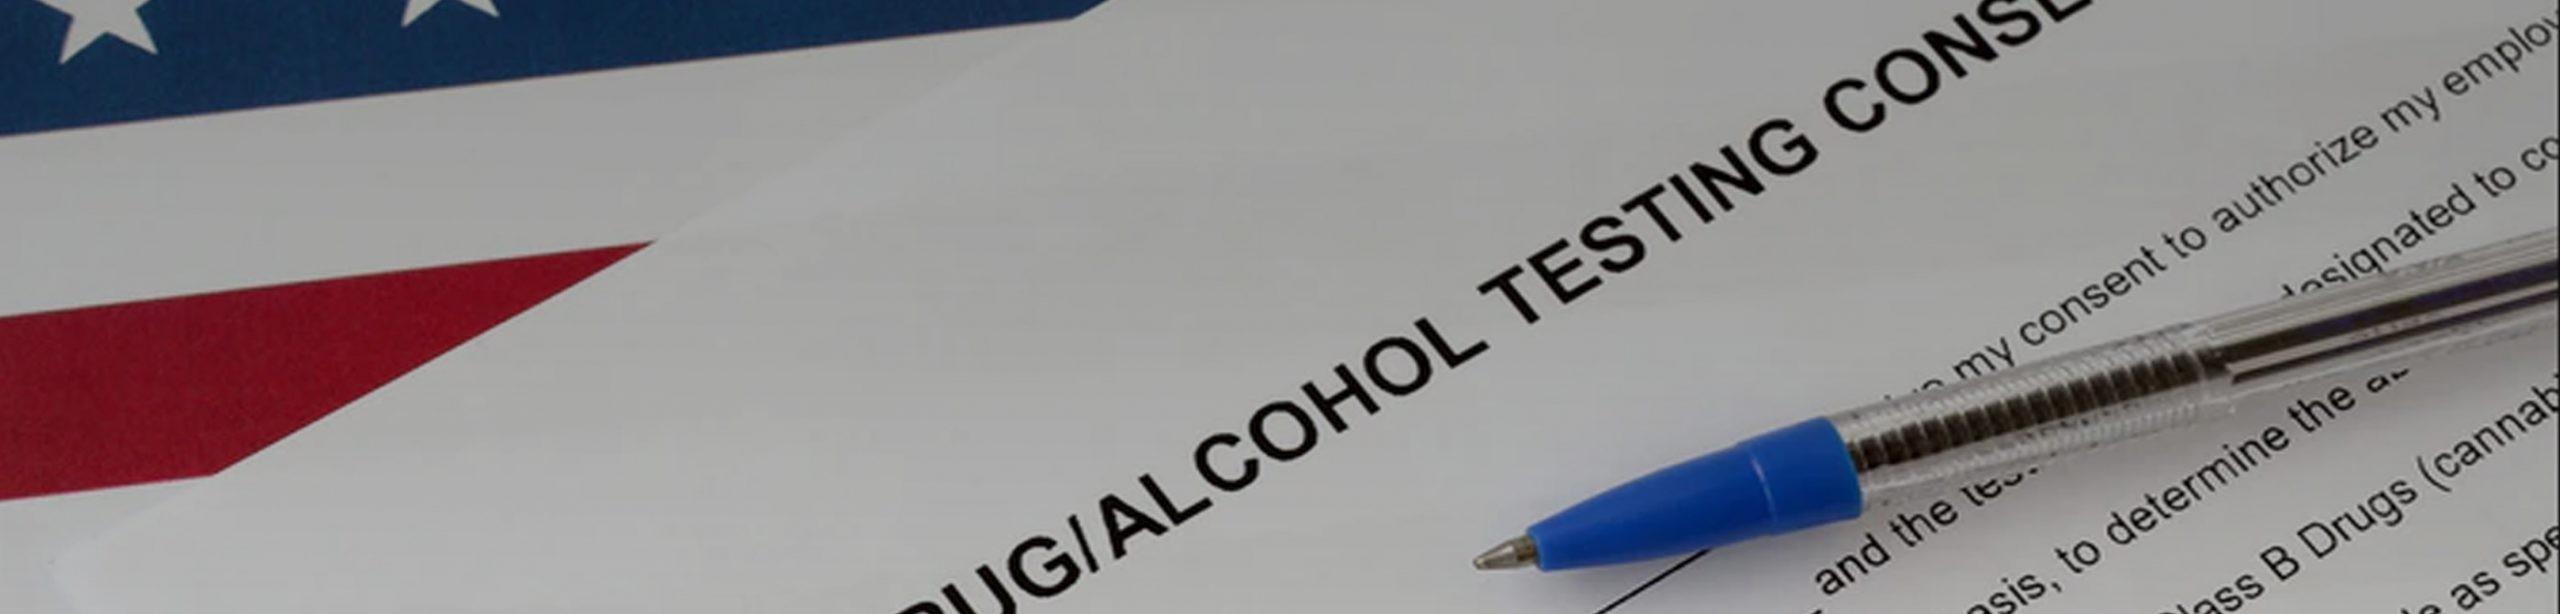 CAN-ICHEAT-ON-A-DRUG-TEST